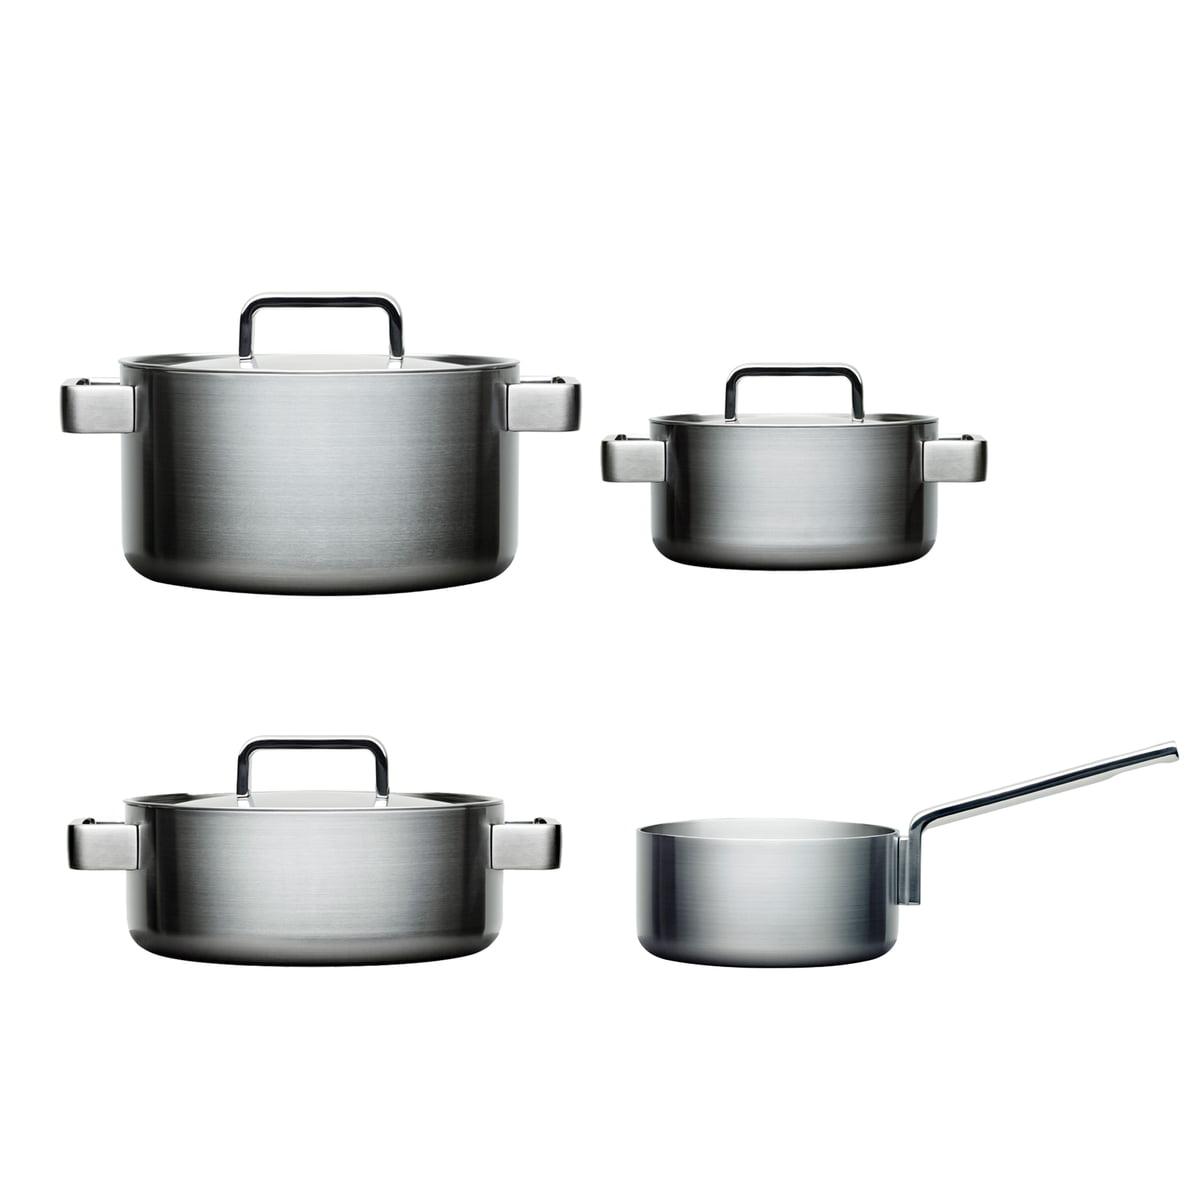 Setverpackung Tools Koch-Töpfe von Iittala